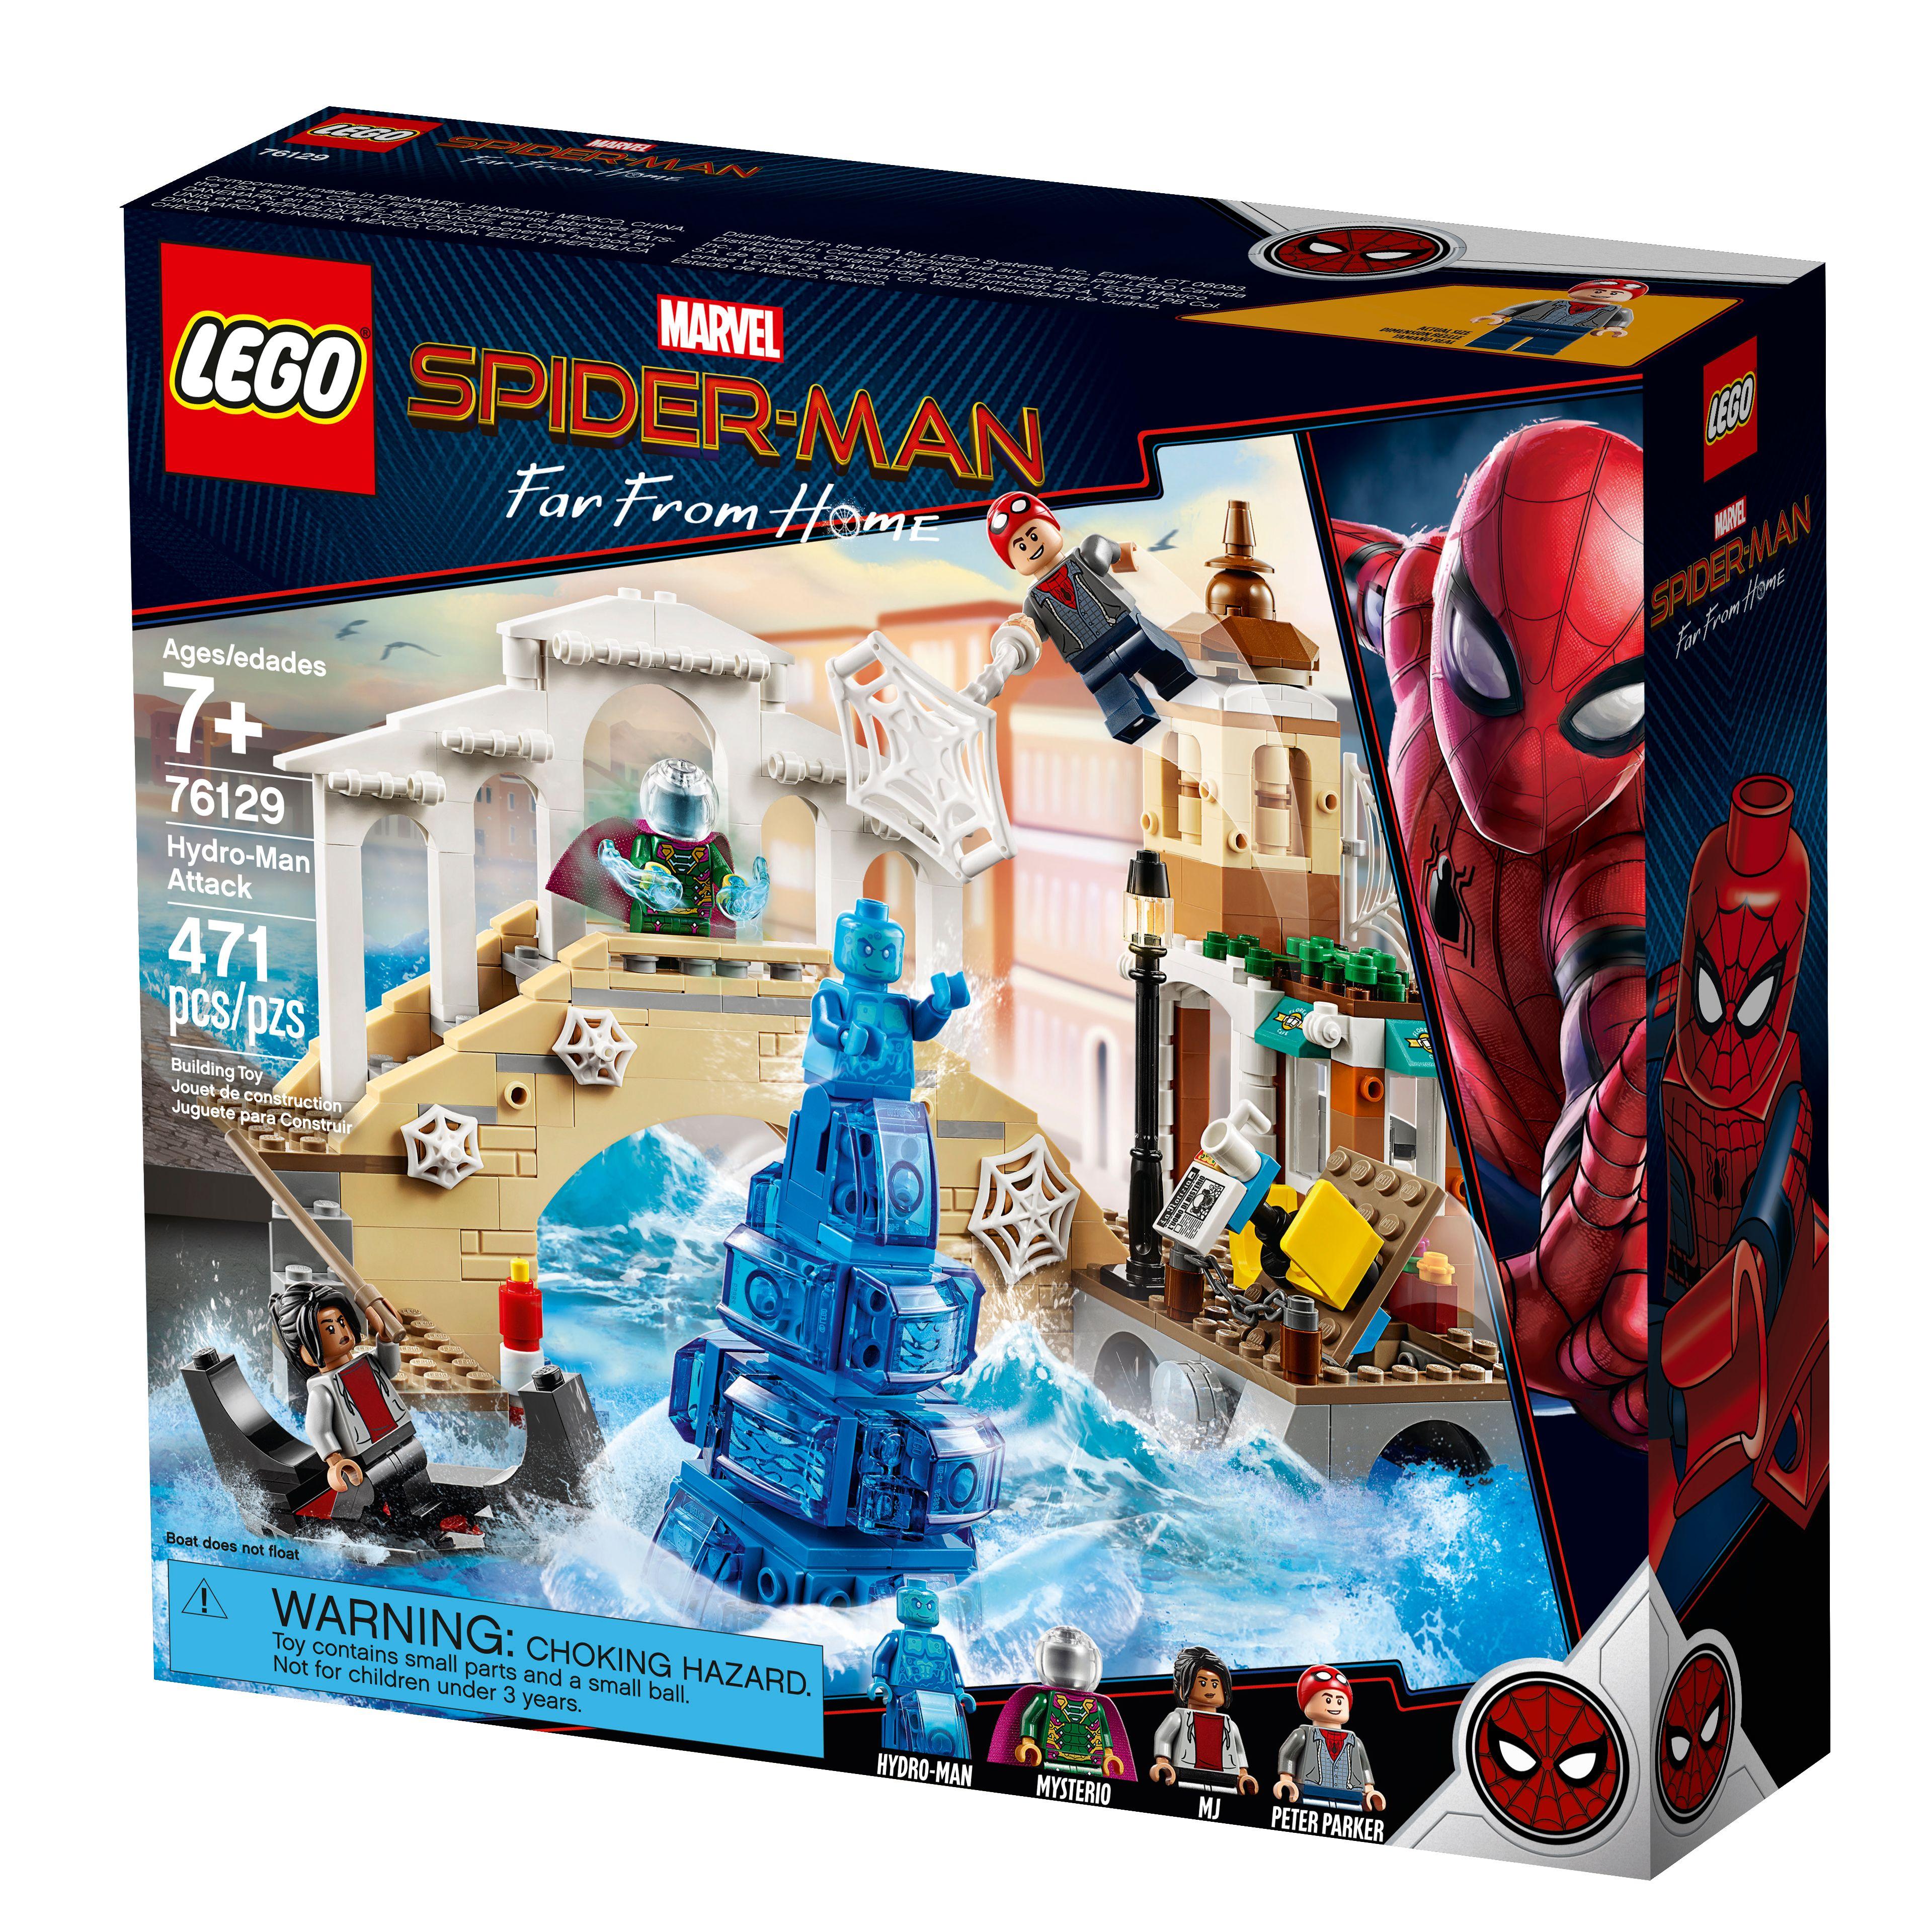 Far From Home New 2019 Film Marvel Building Blocks Toys Peter Parker Spider-Man